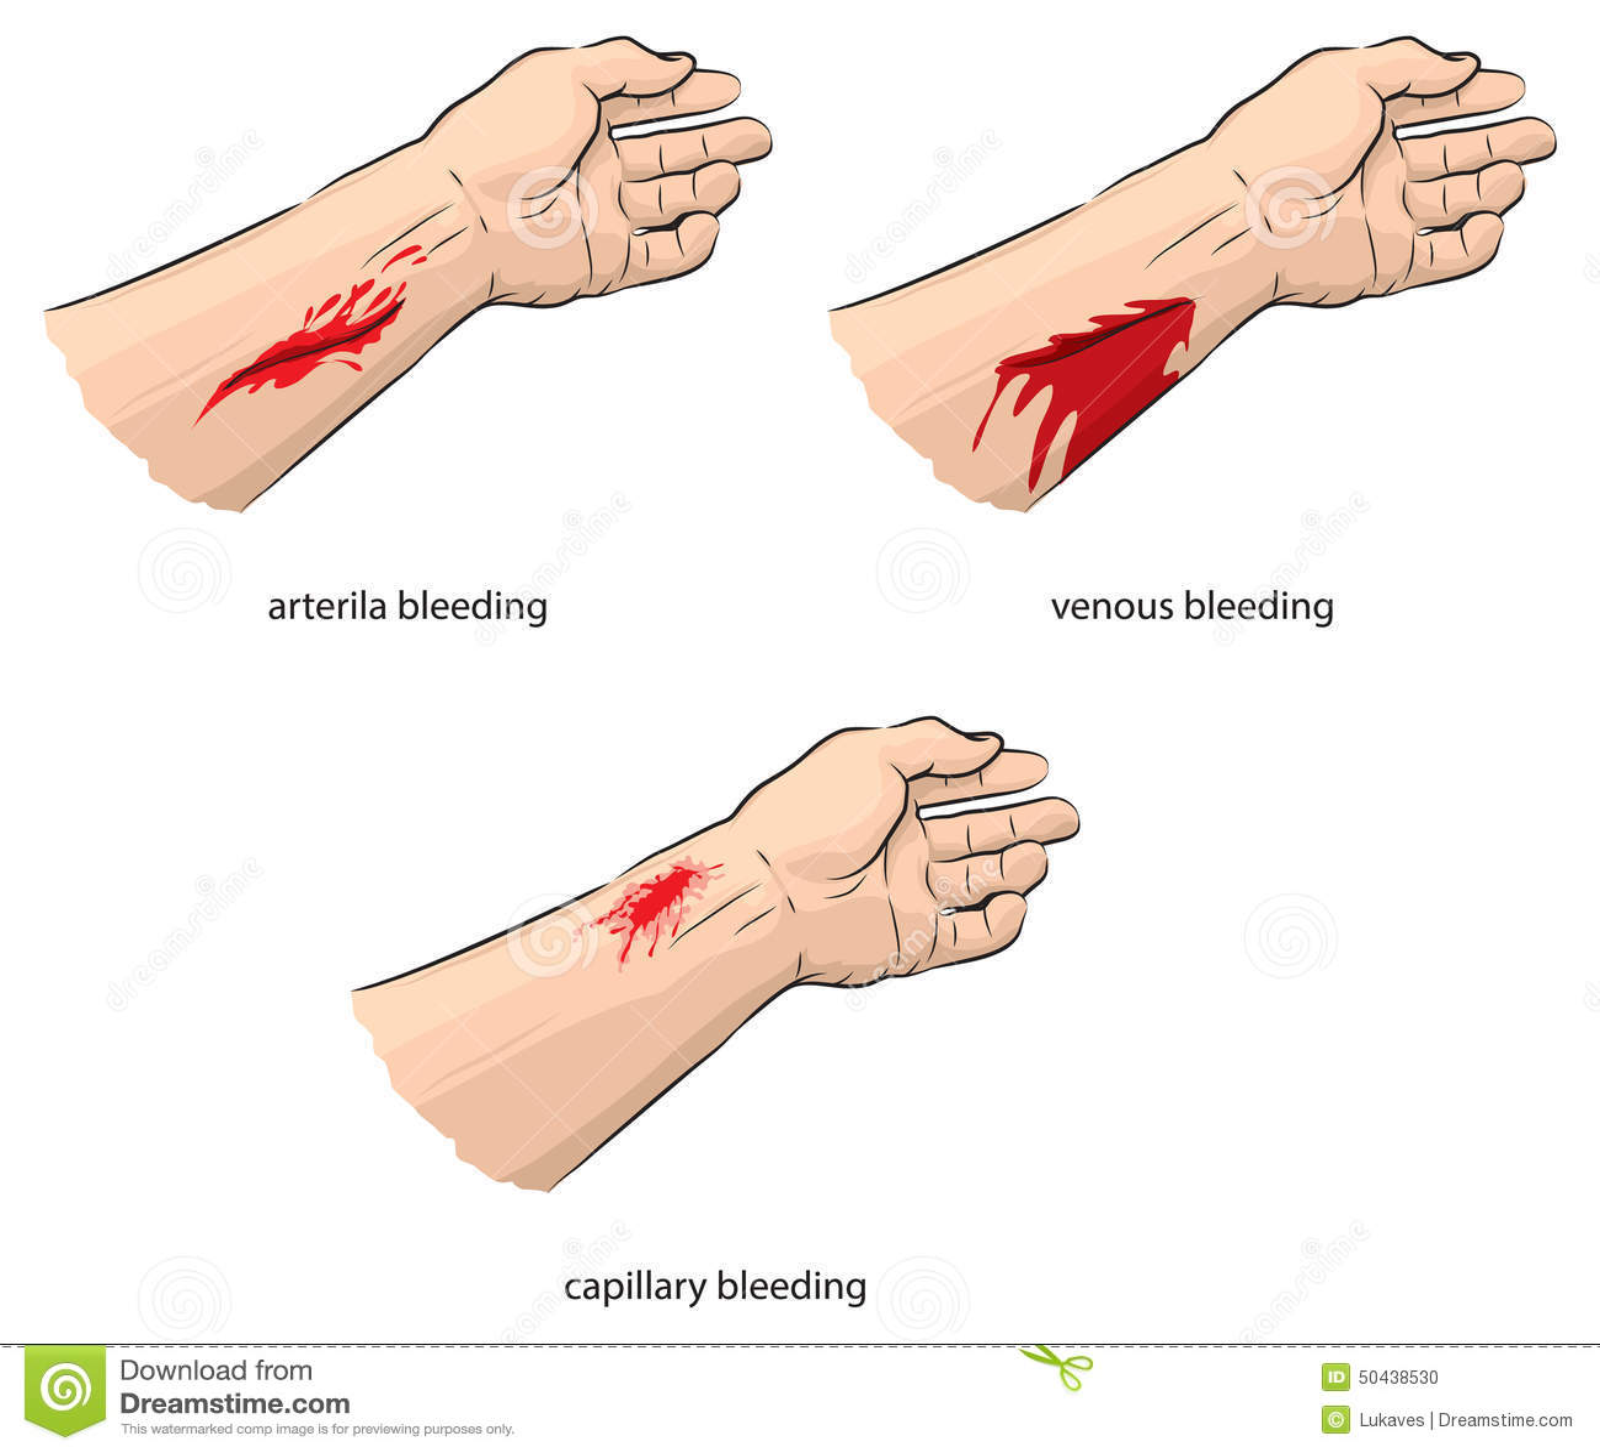 how to stop bleeding cut thumb